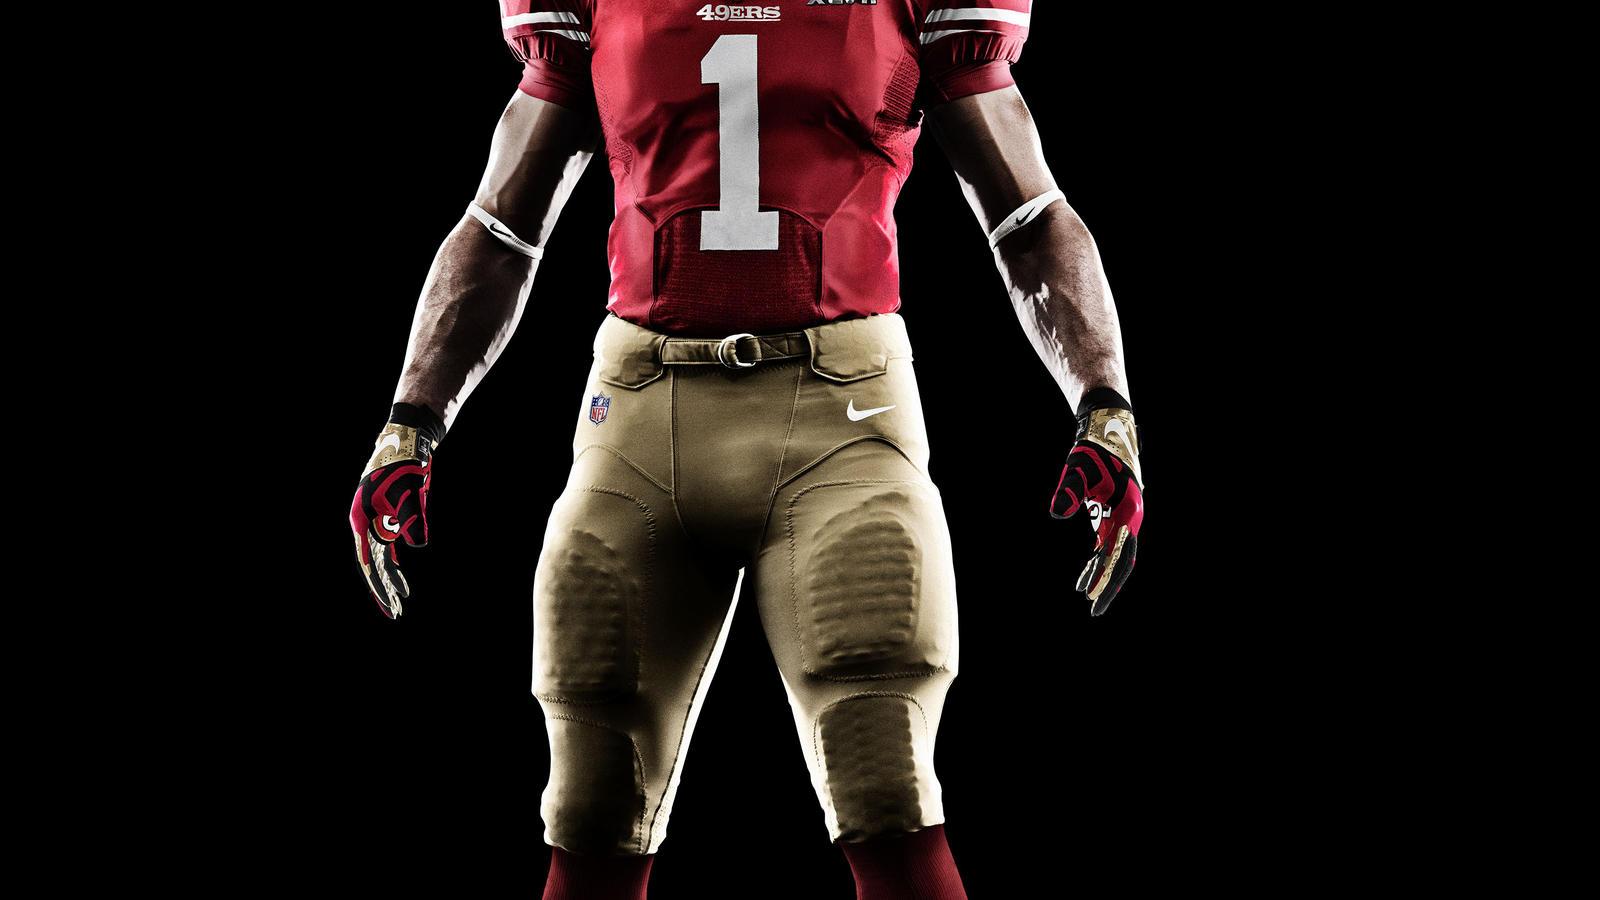 49ers_Super_Bowl_Uniform